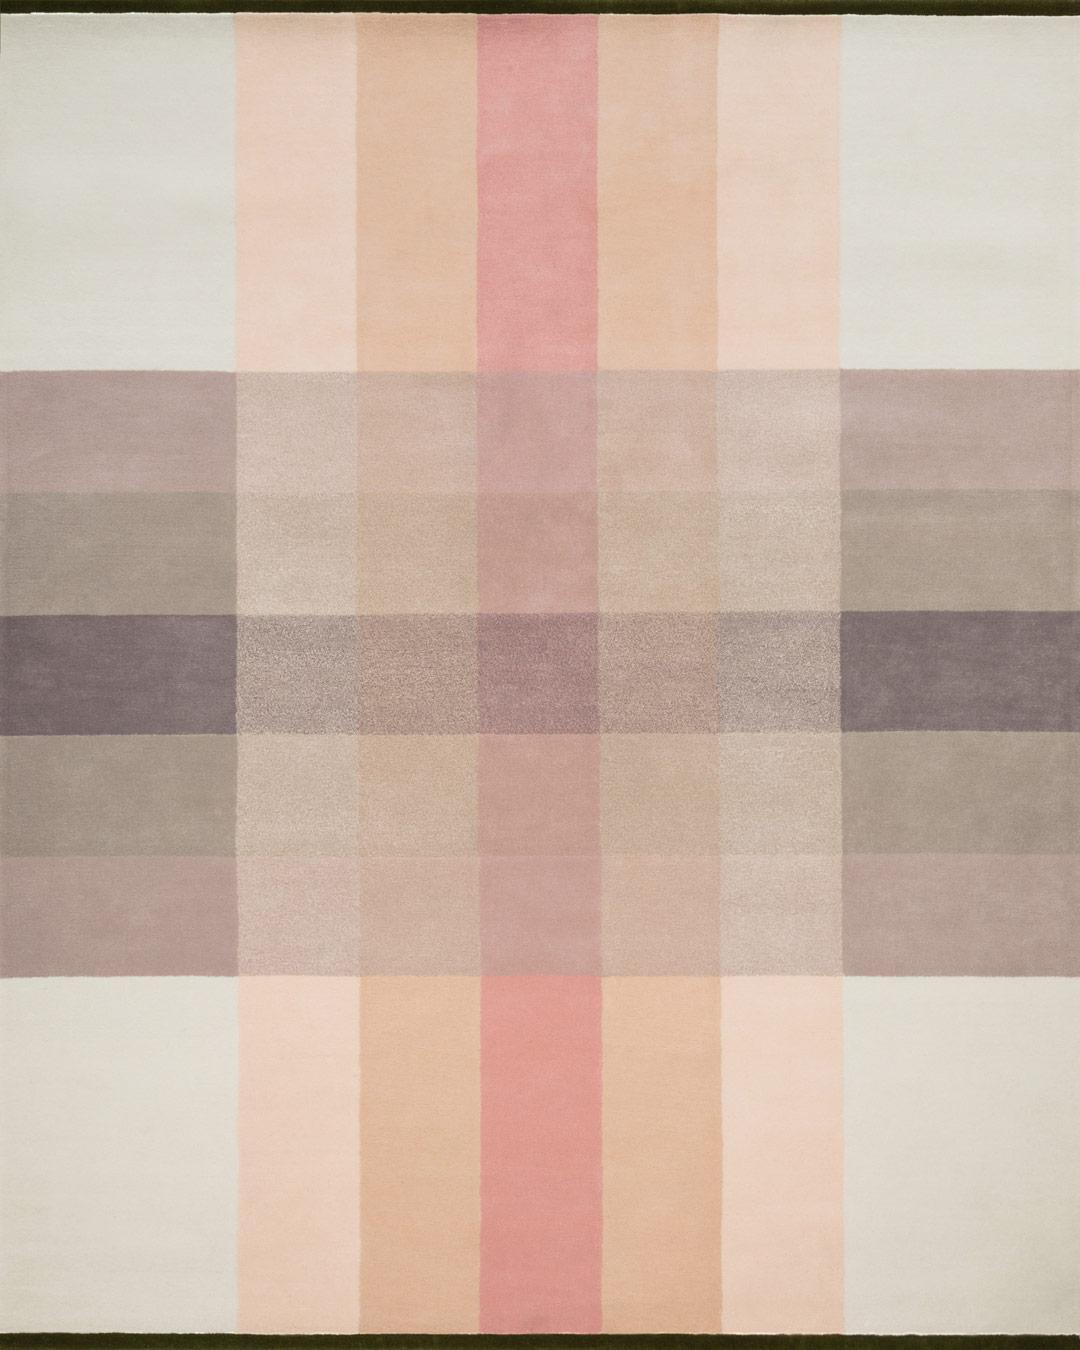 overhead of crossing rug by bernabeifreeman in large checkered pattern in pale pink beige and brown